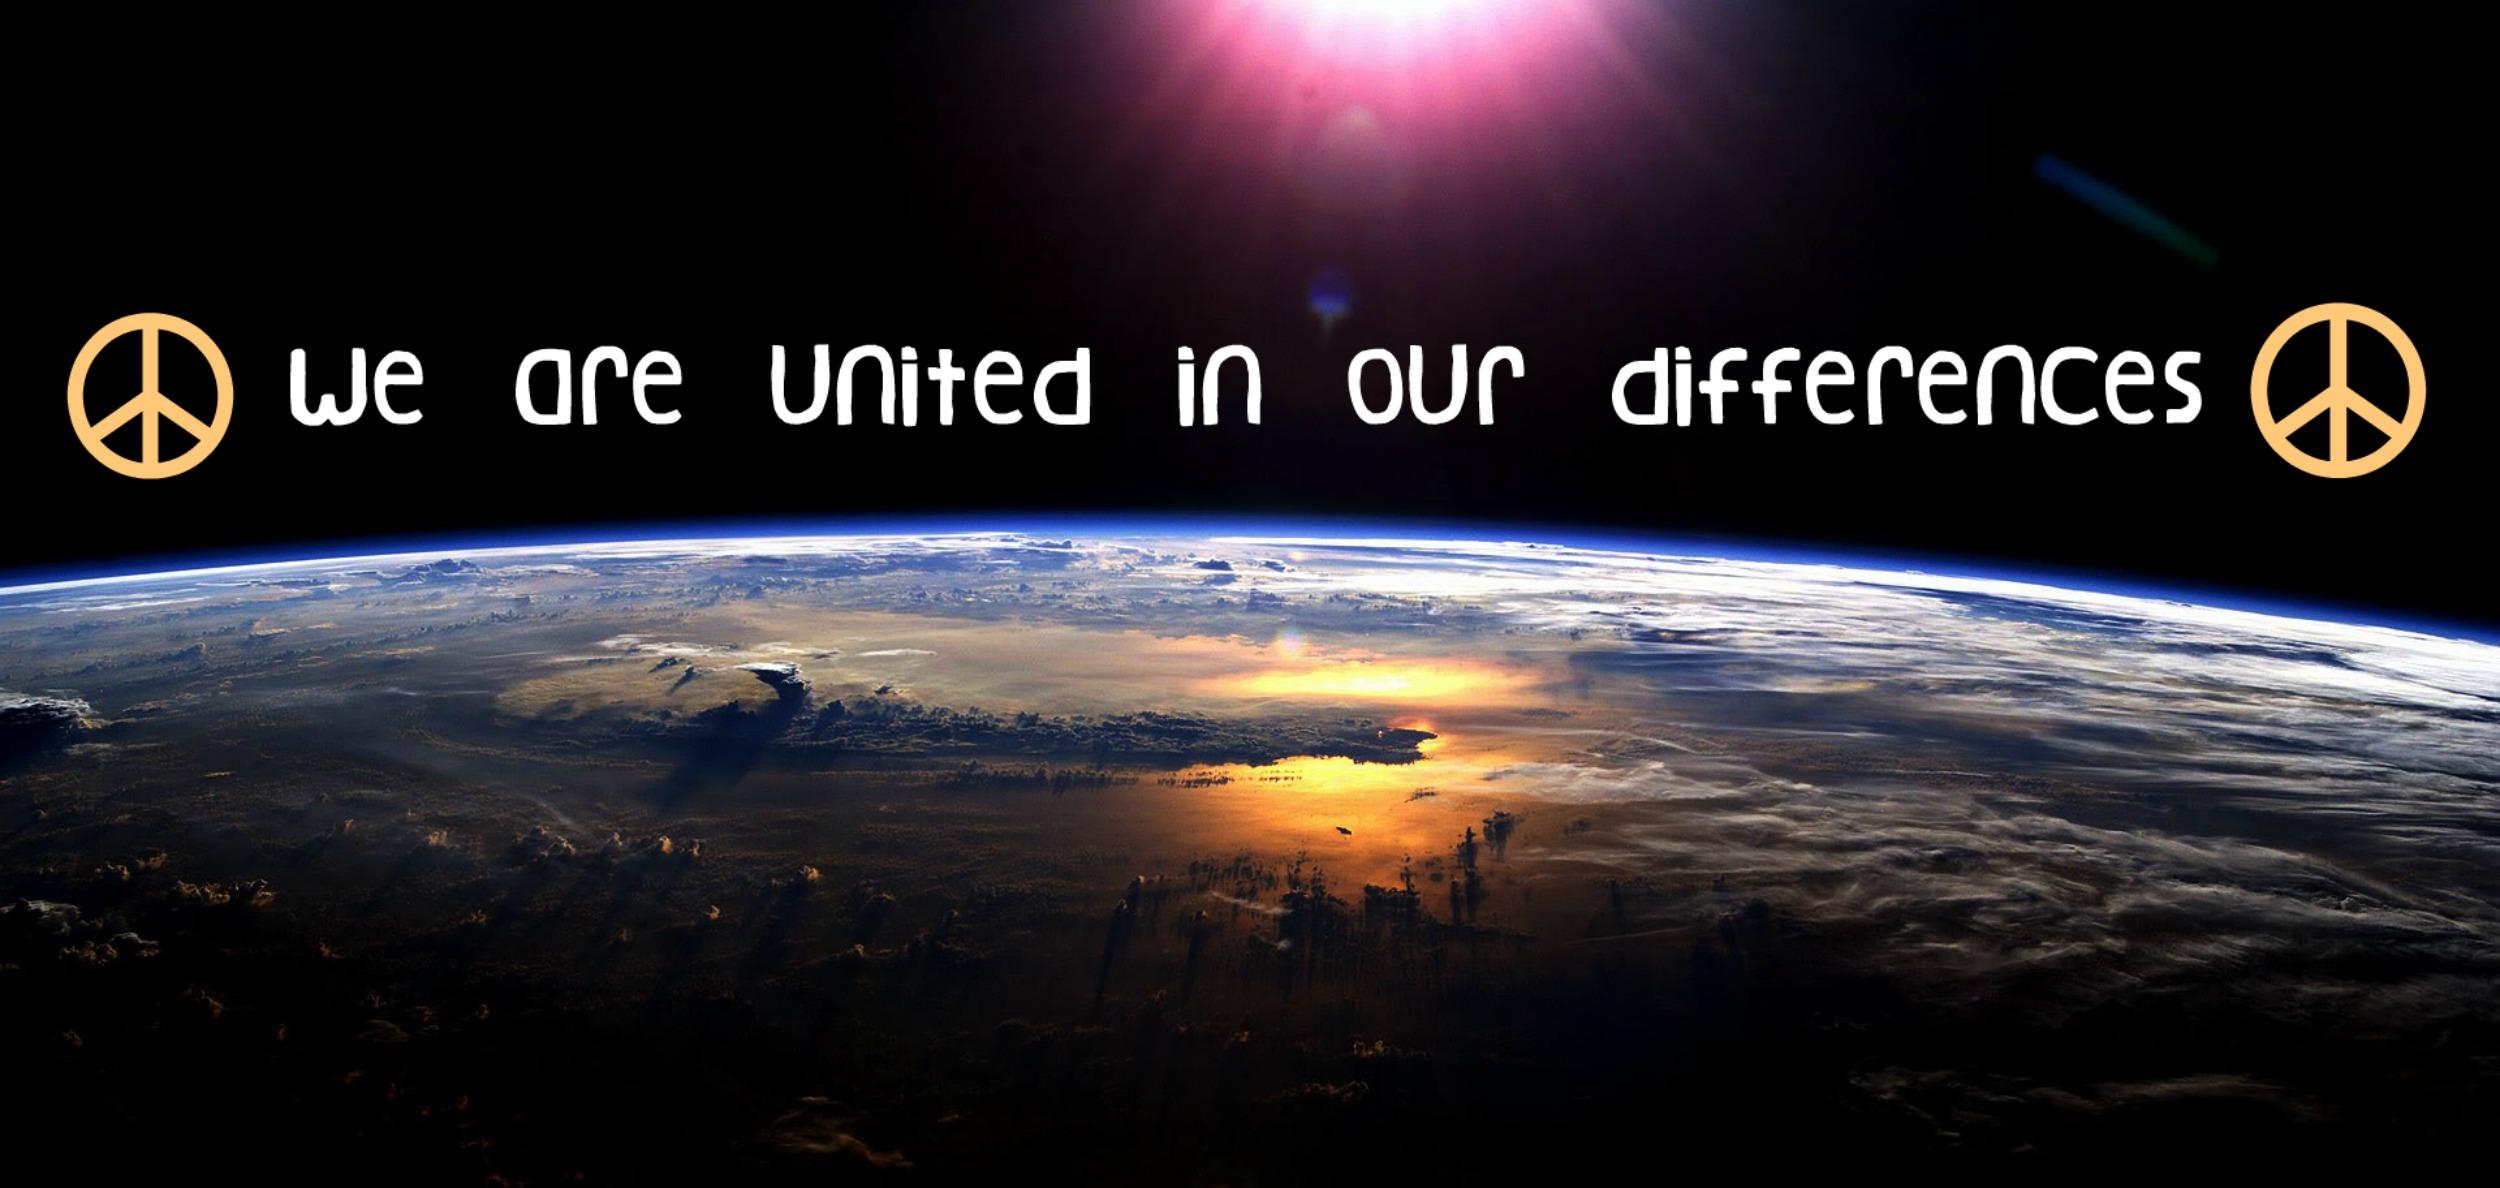 earth quotes tumblr - photo #30